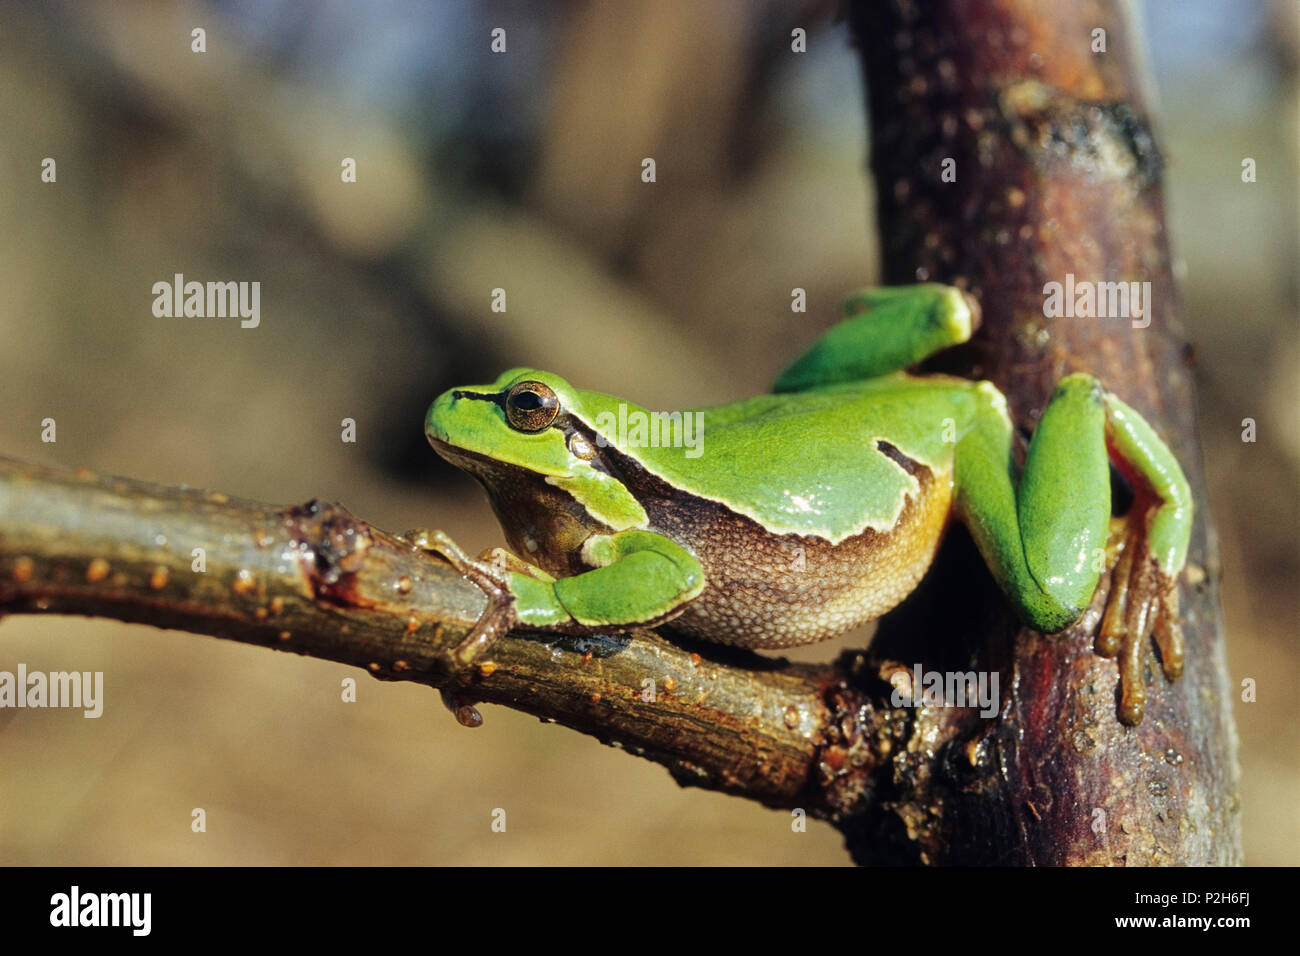 Tree Frog, Hyla arborea, Austria Stock Photo